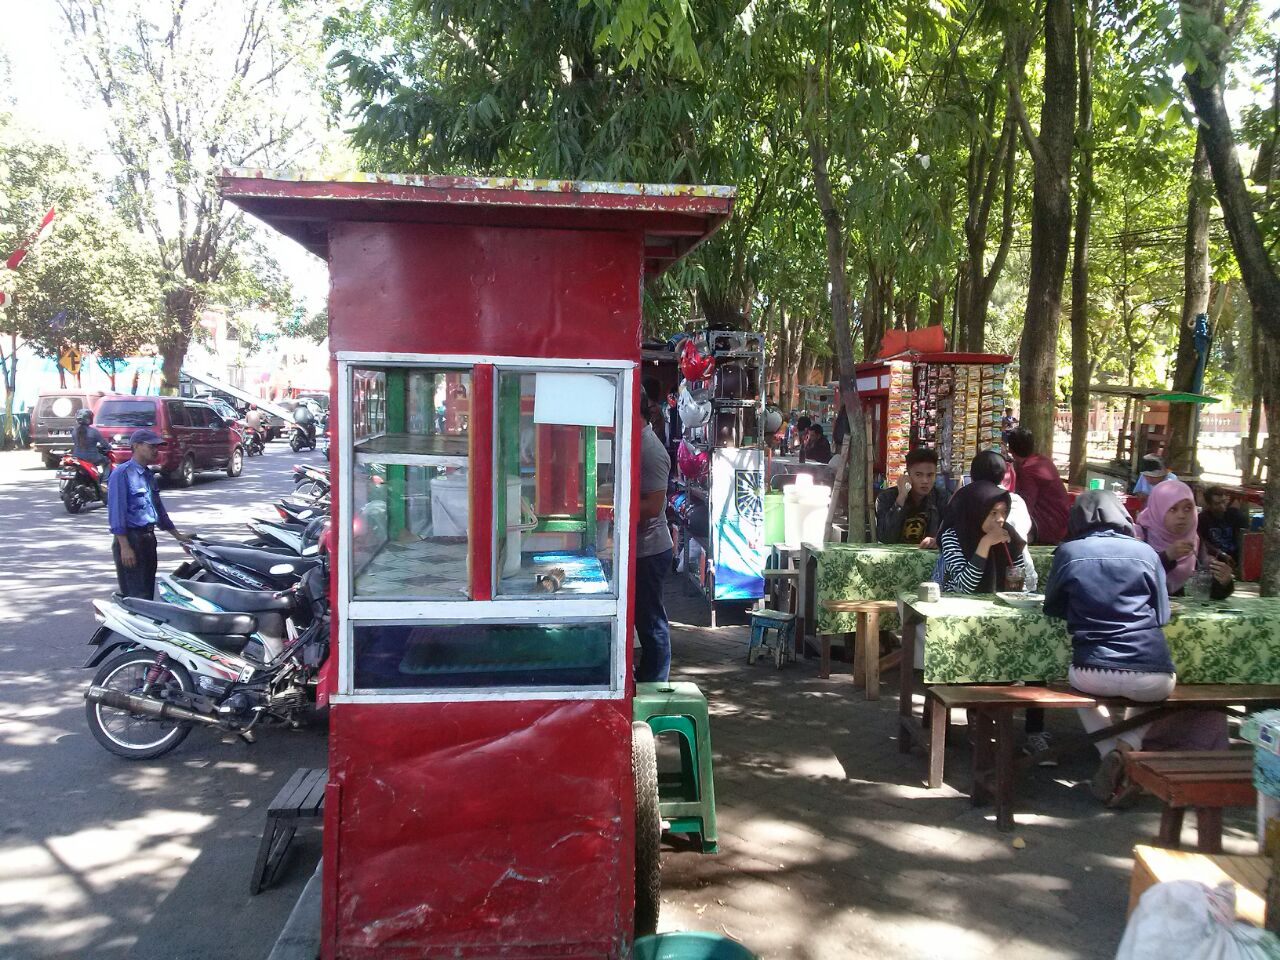 Wisata 5 Kuliner Terfavorite Alun Kota Probolinggo Kab